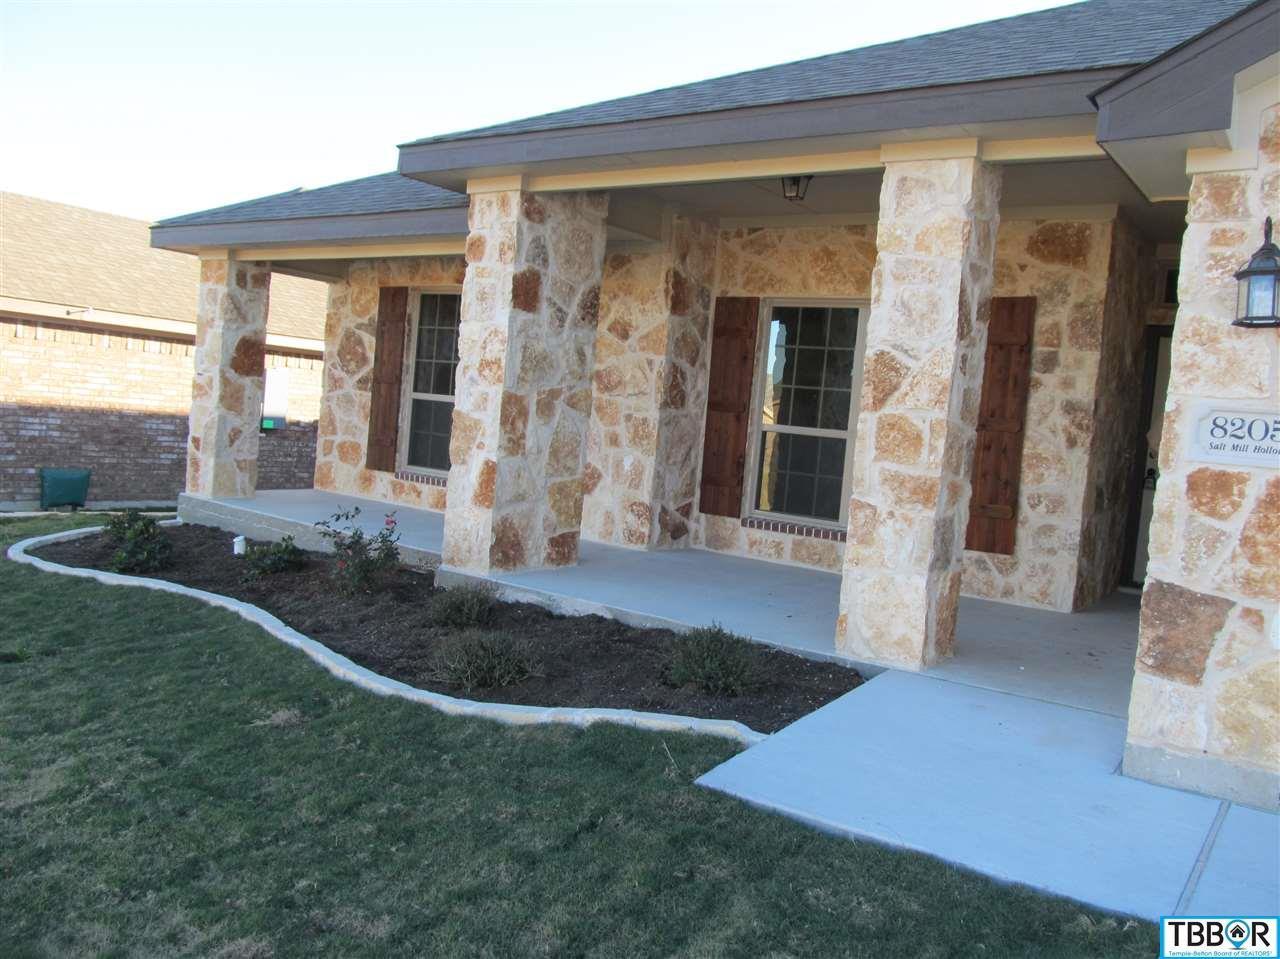 8205 Saltmill Hollow, Temple TX 76502 - Photo 2